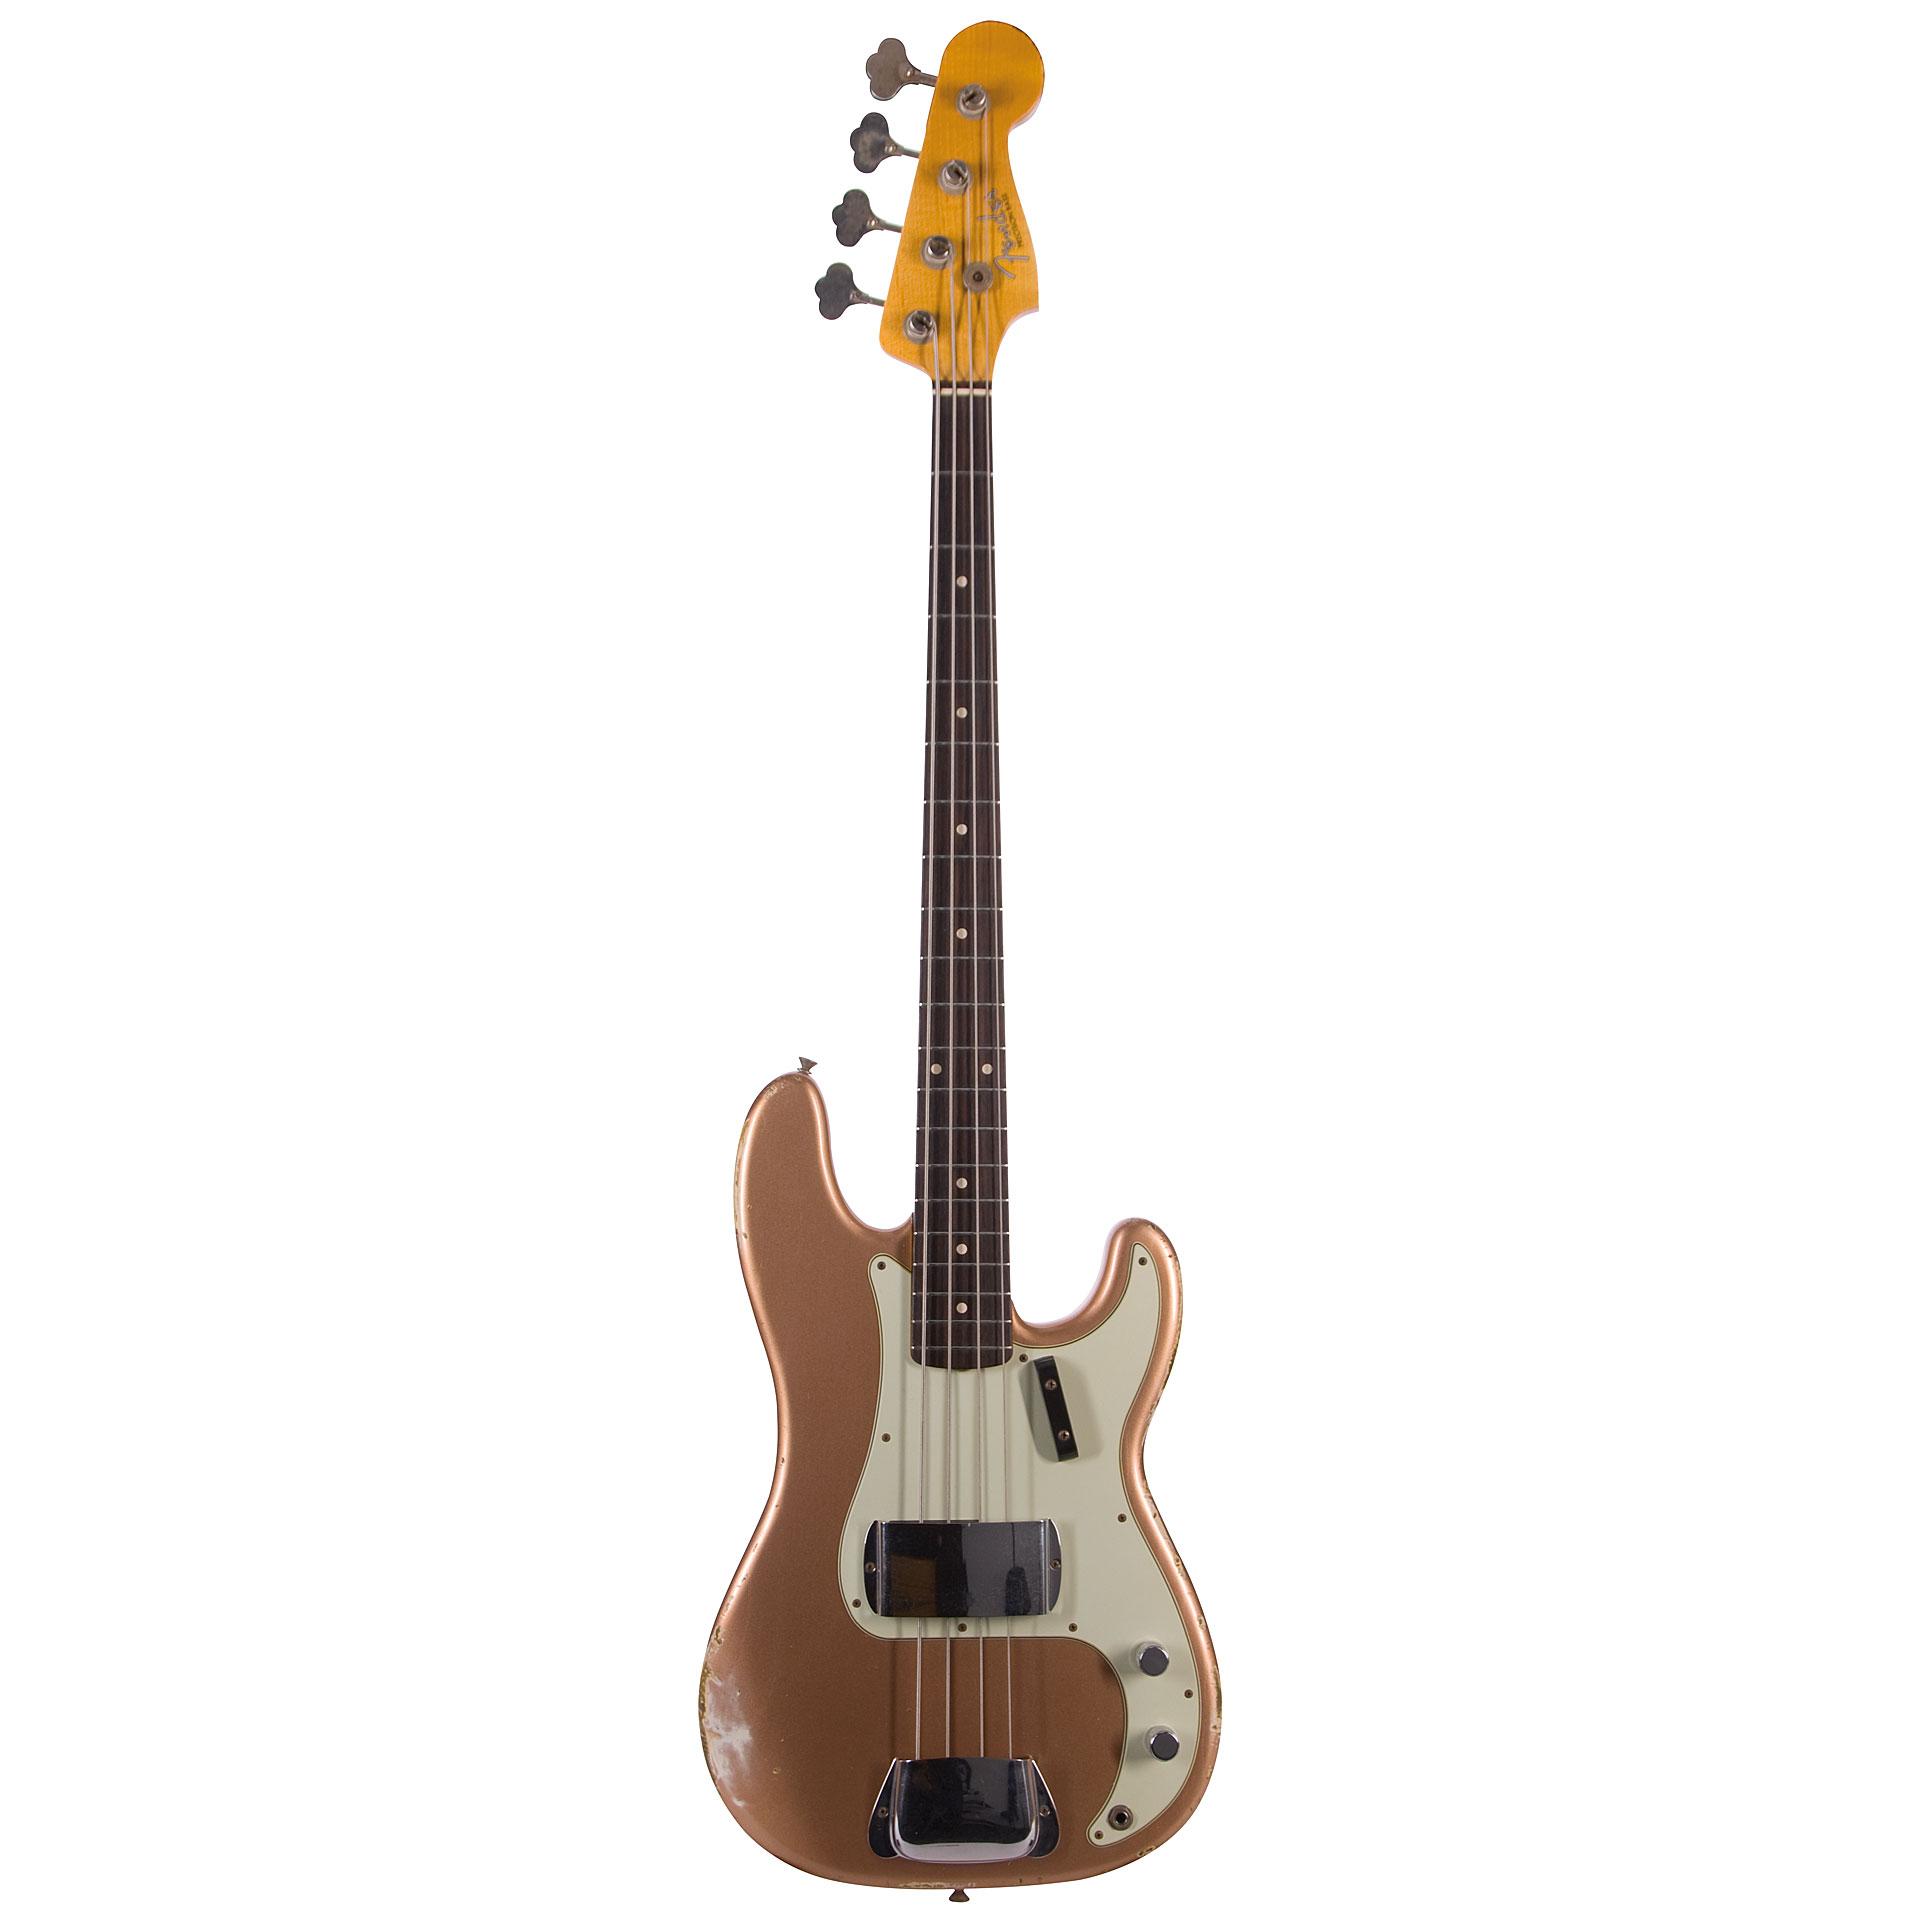 fender custom shop 1959 precision bass relic electric bass guitar. Black Bedroom Furniture Sets. Home Design Ideas